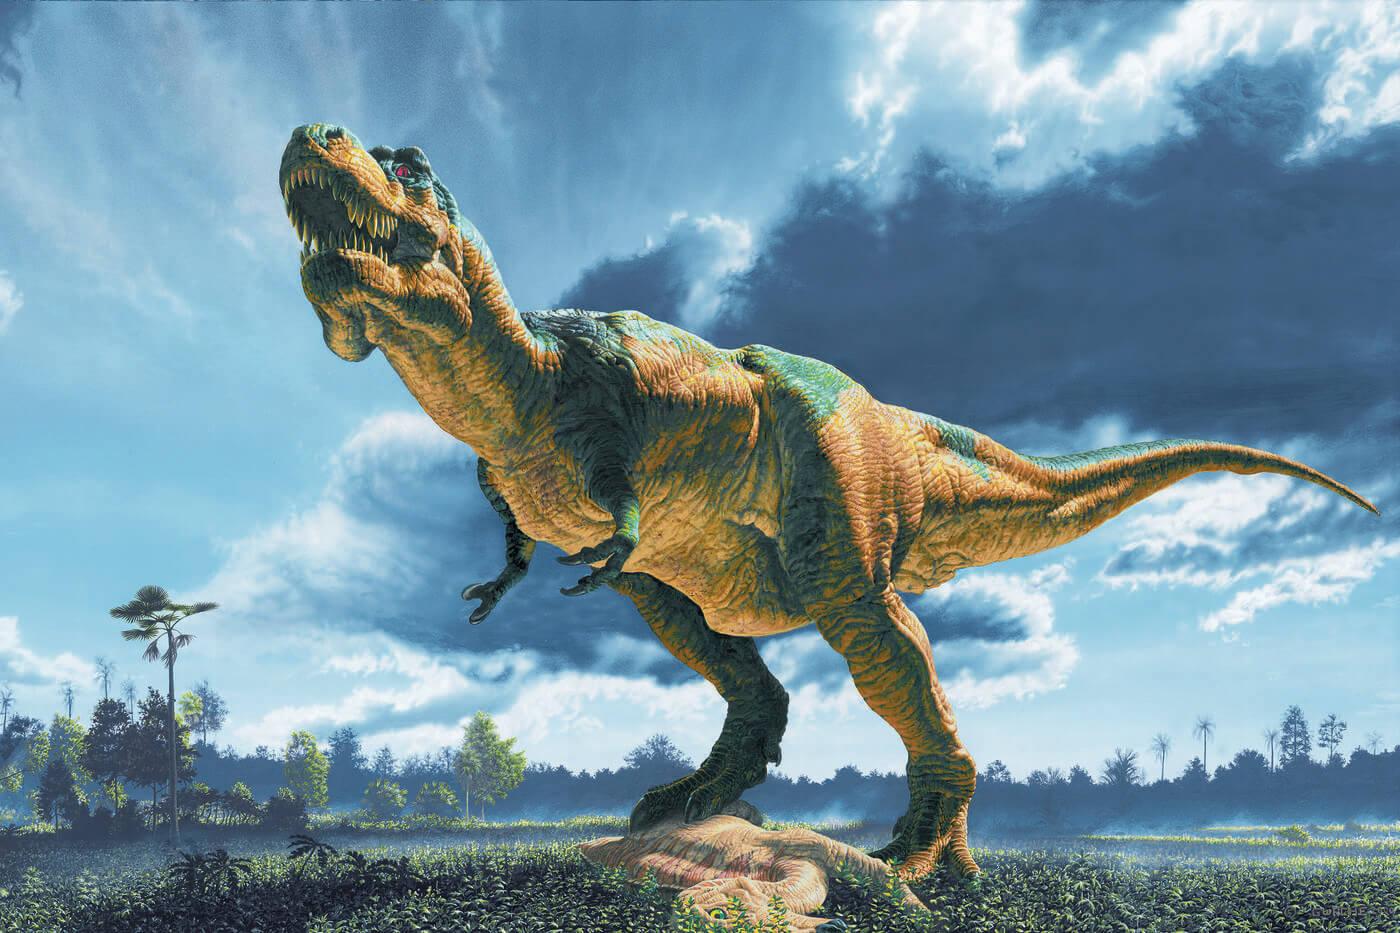 T-Rex Dinosaur - Original image